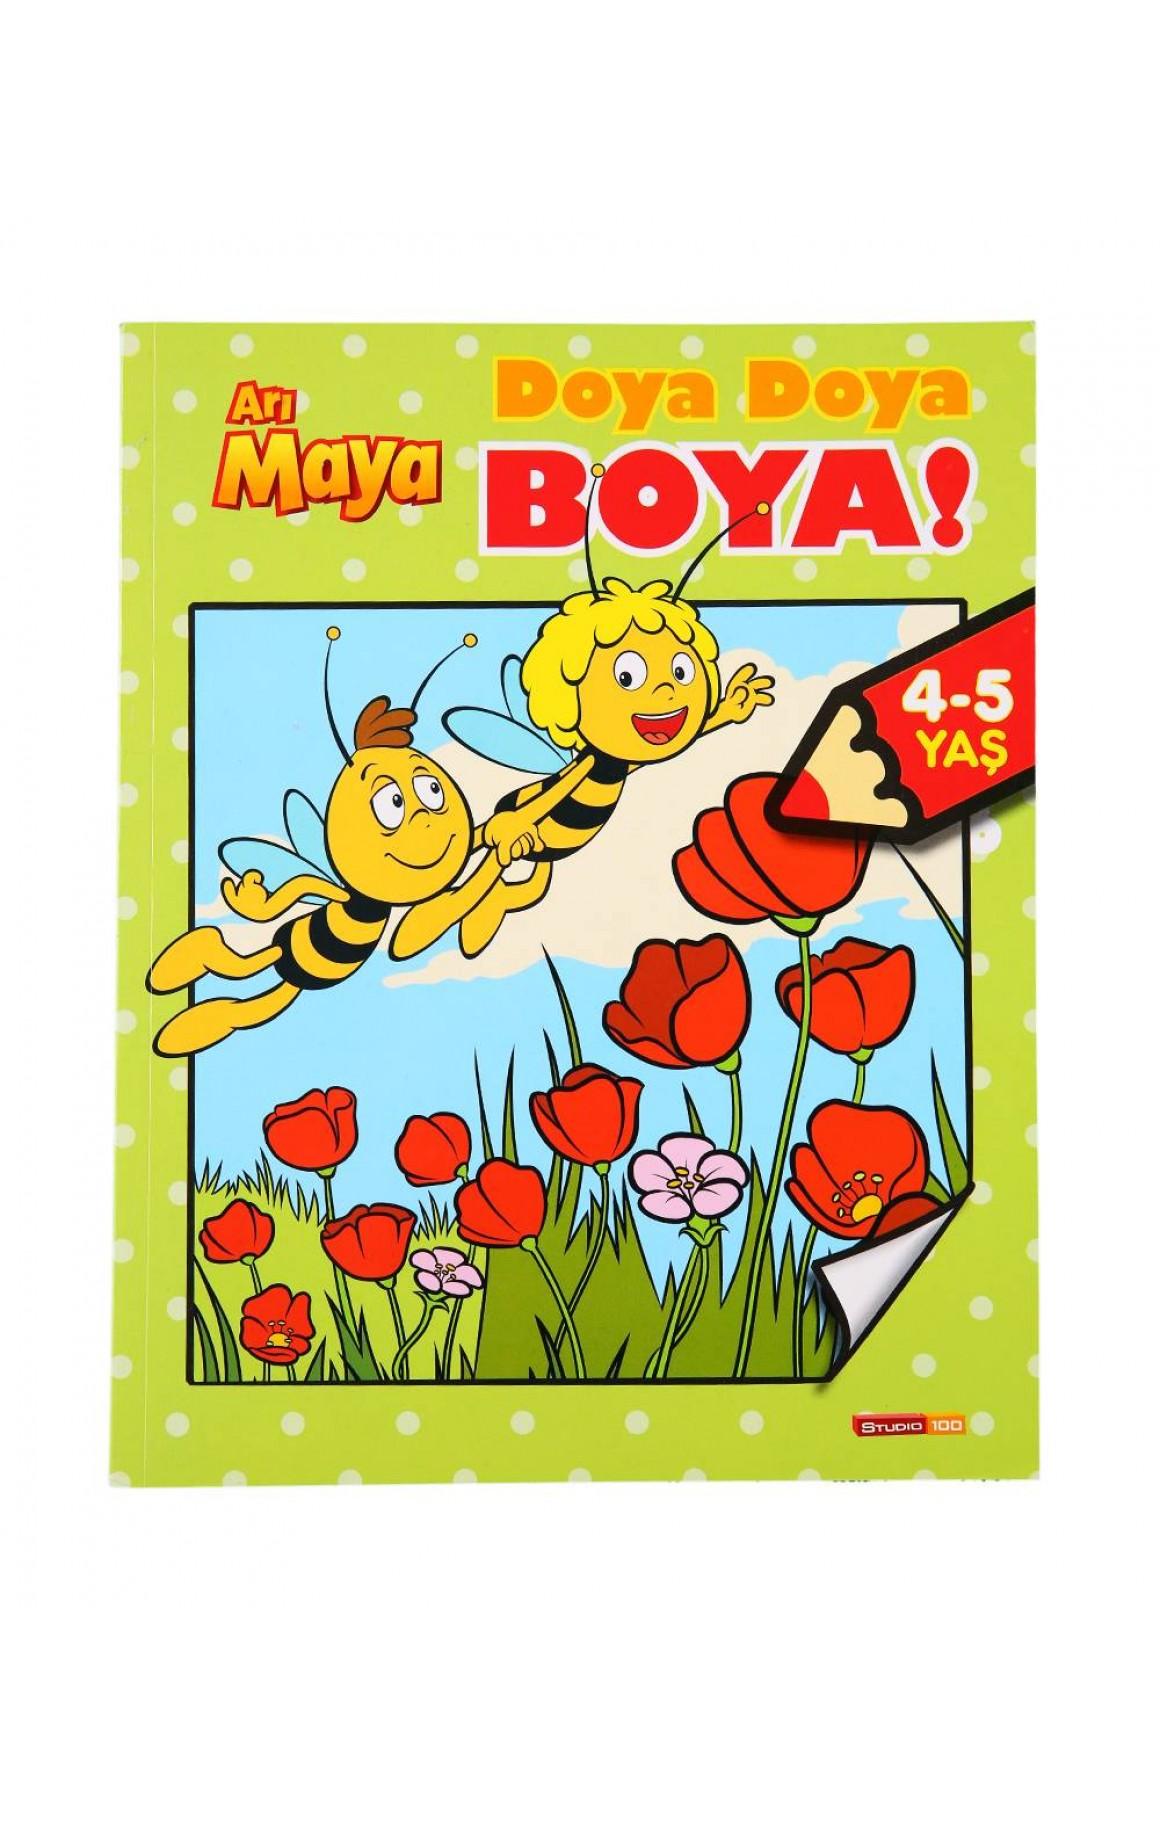 Doya Doya Boya Ari Maya 4 5 Yas